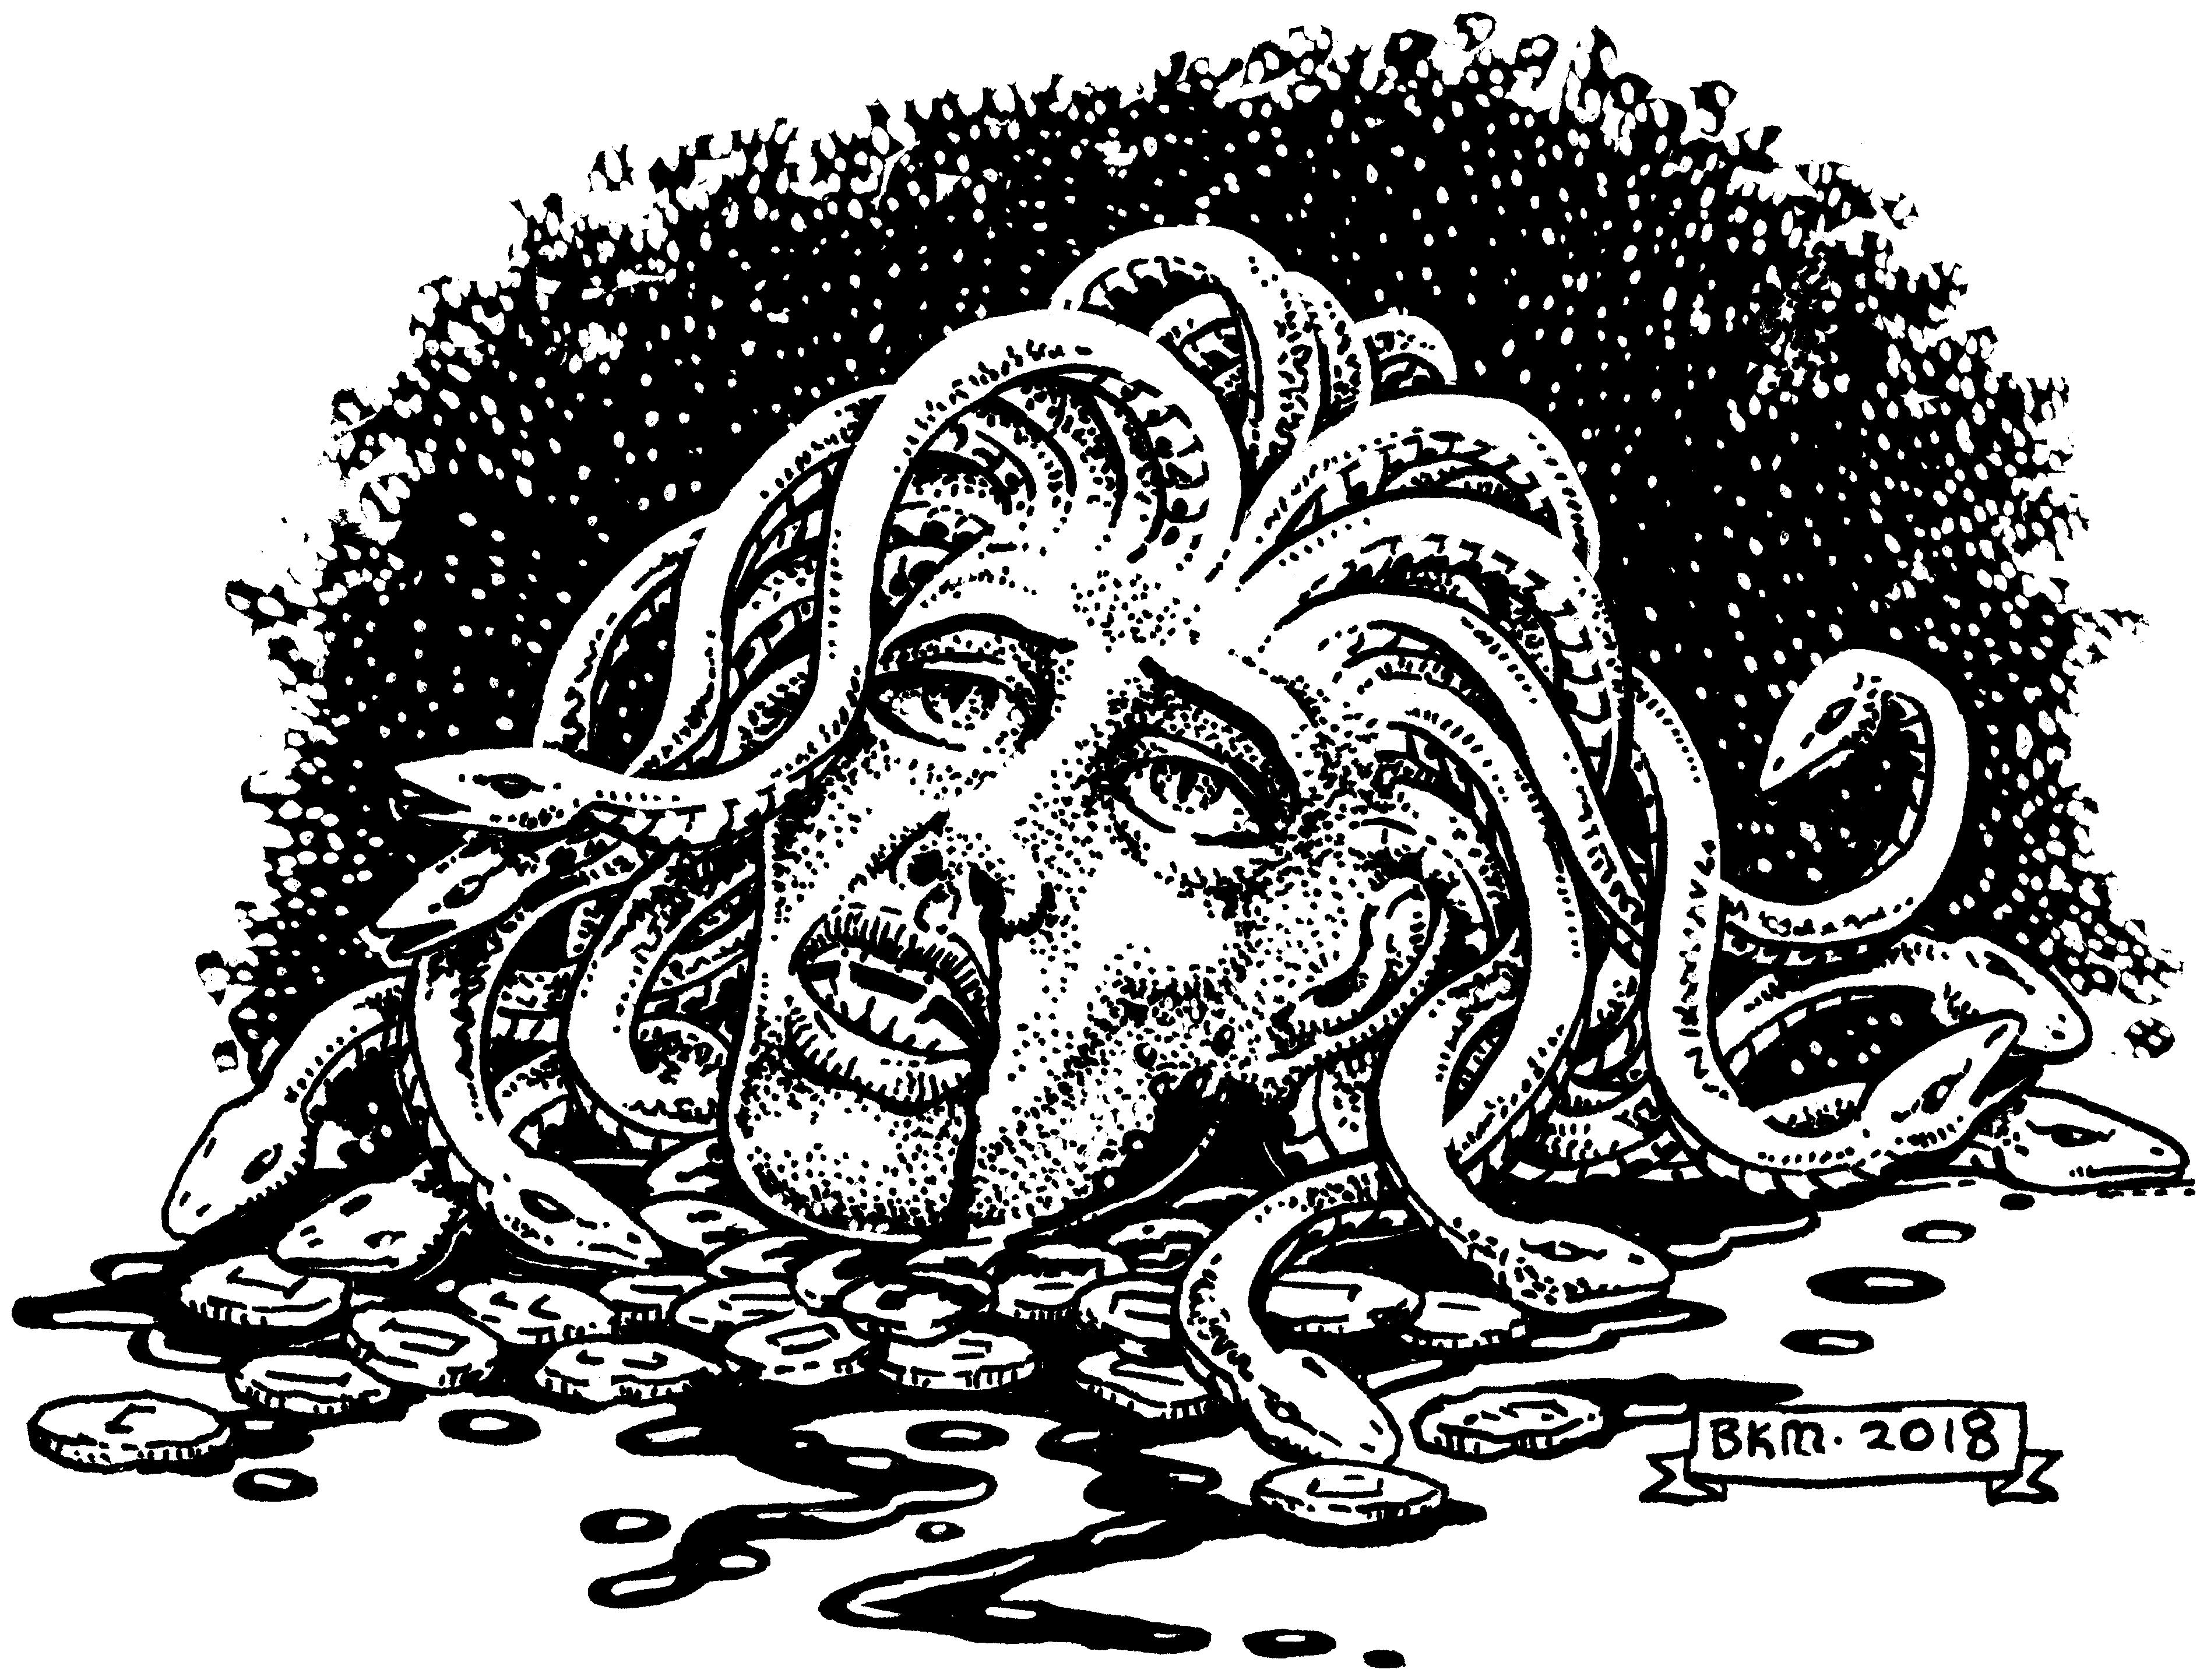 CAC530-Decapitated Medusa by BKMcDevitt